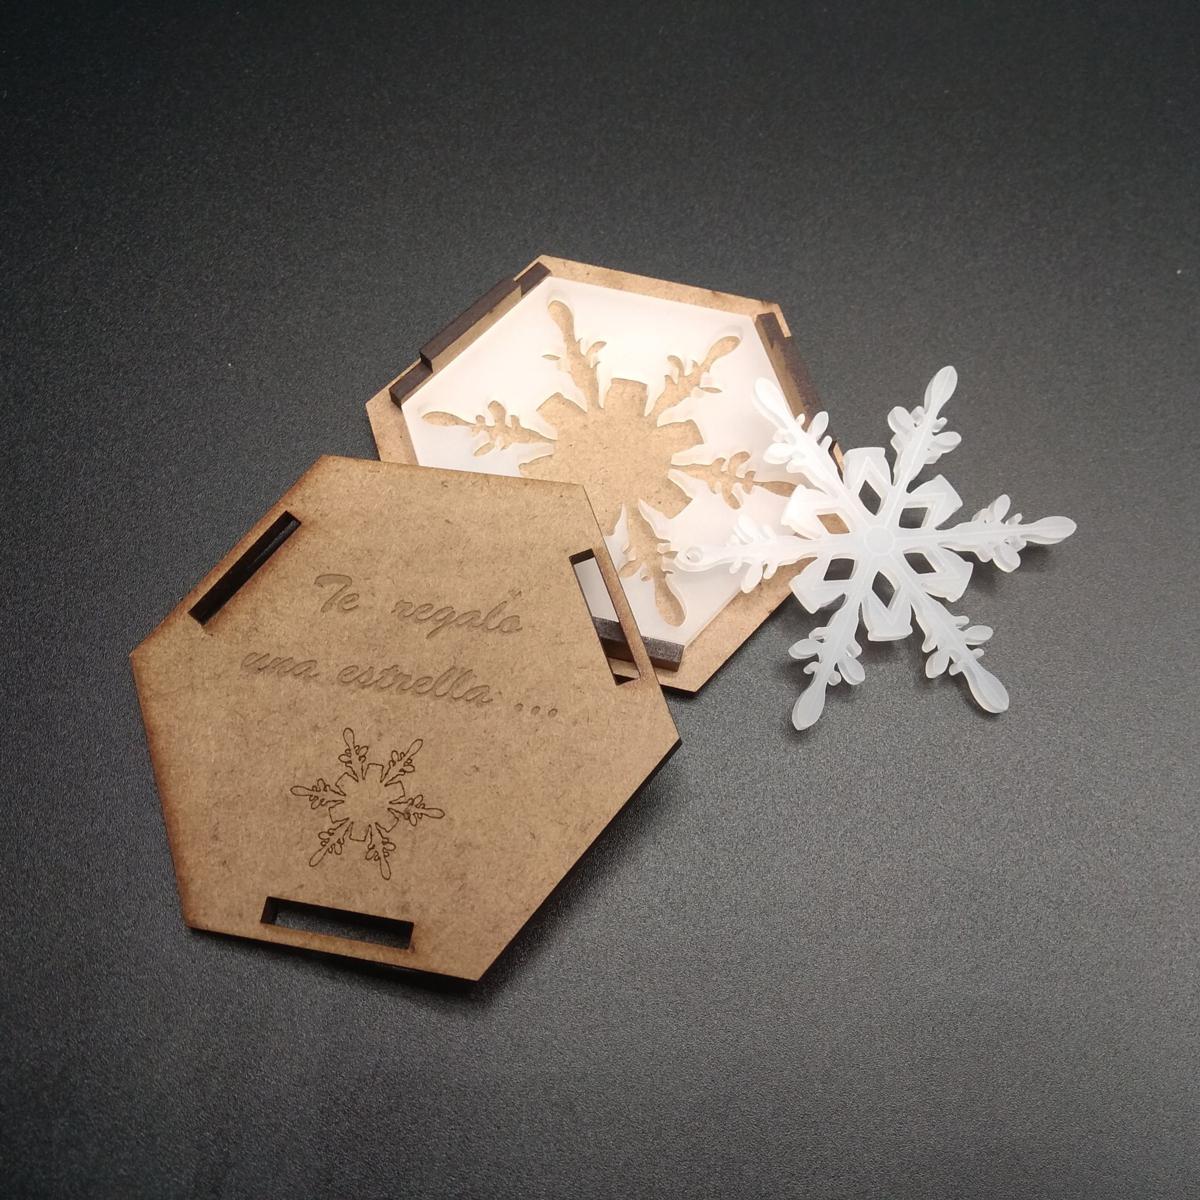 Estrella metacrilato con caja (modelo 1)